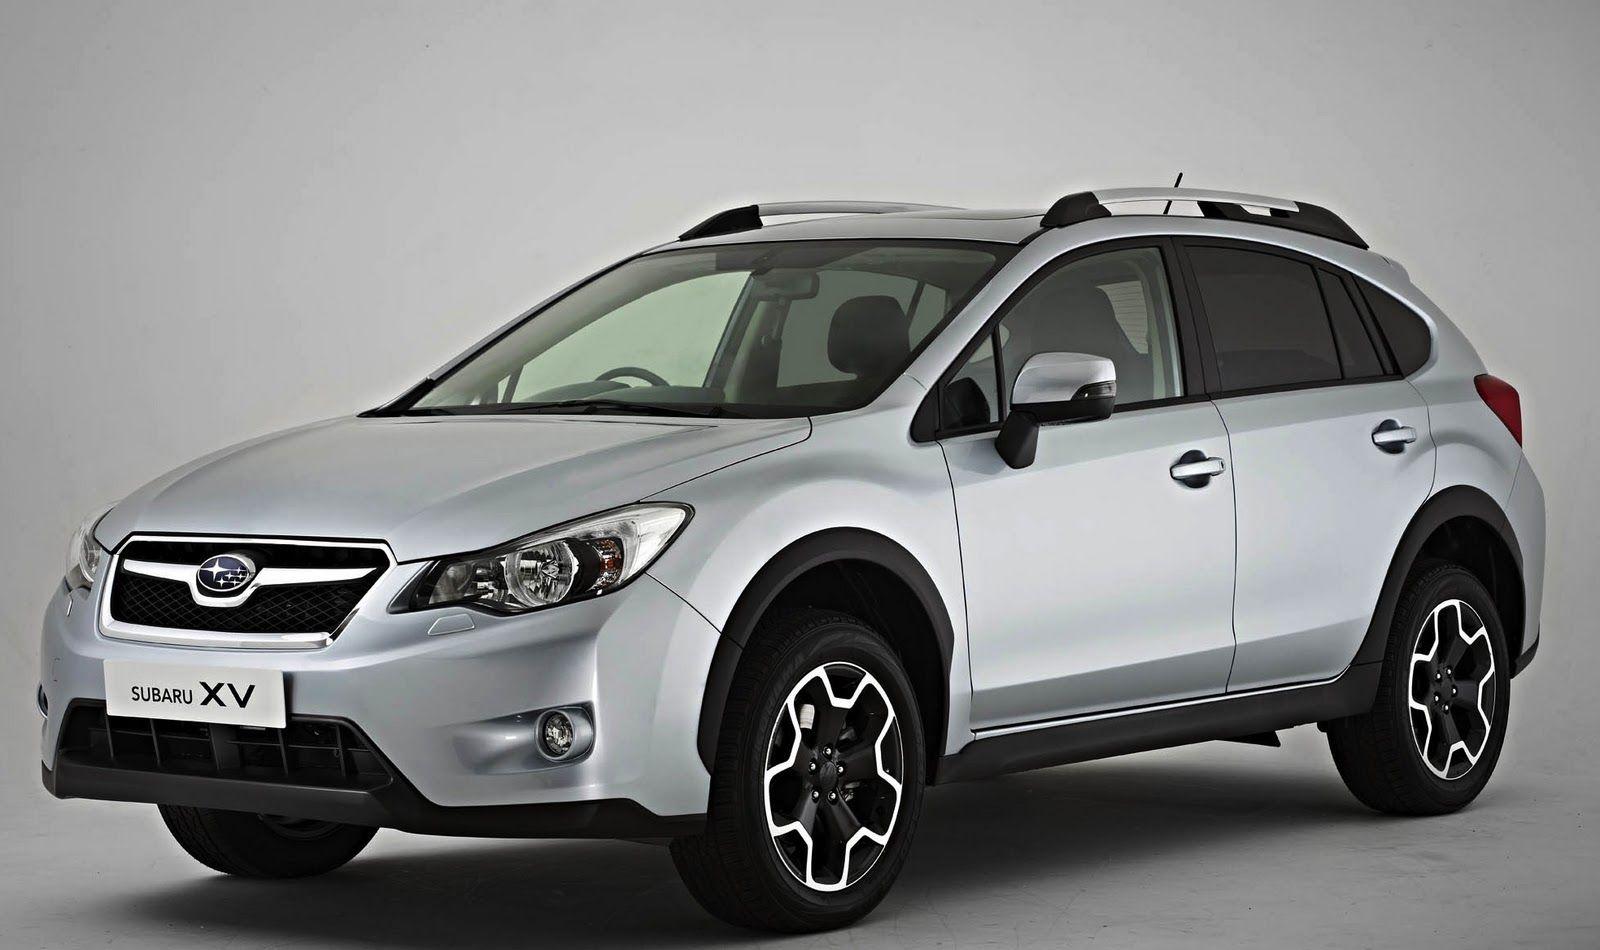 Subaru Xv With A Turbo Diesel Please Car Rental Car Car Hire